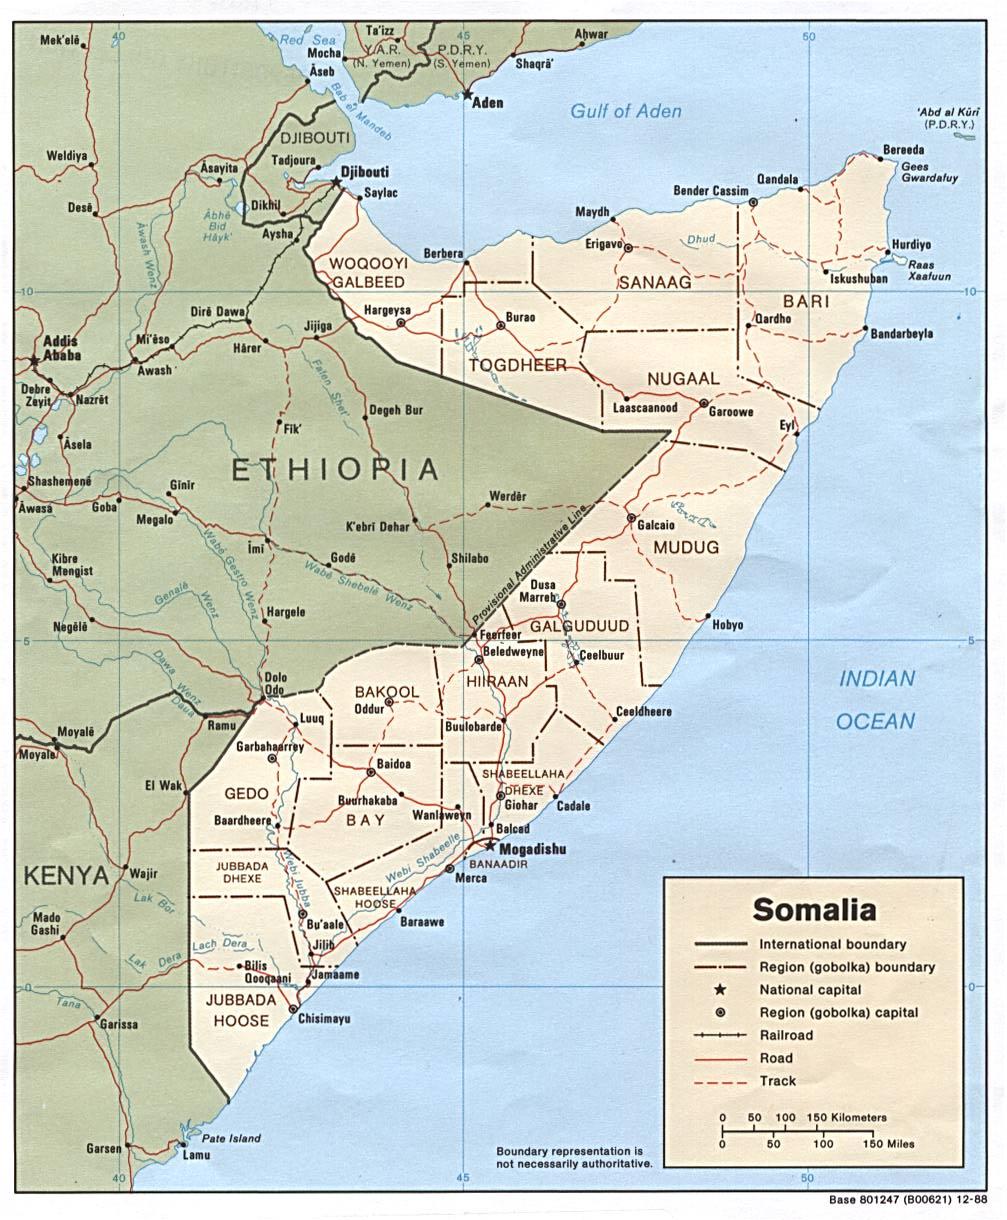 Somalia Political Map